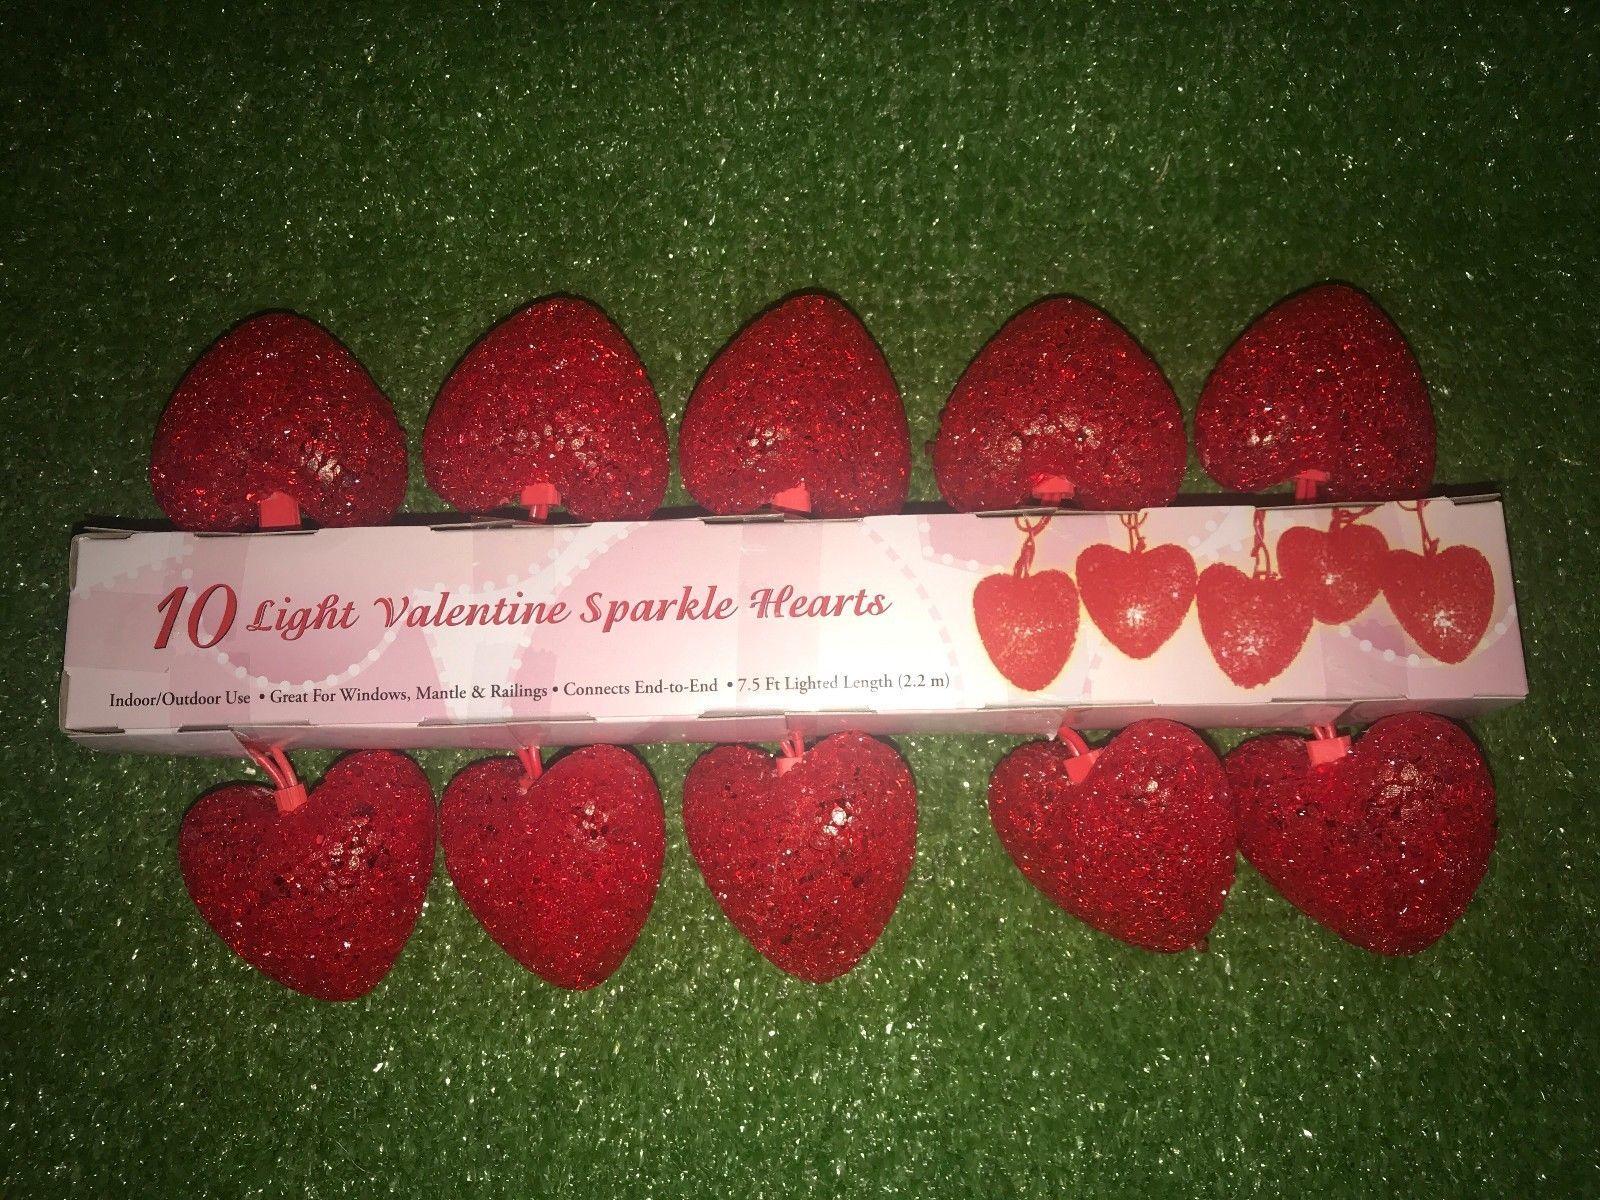 New Set Of Ten Red Gel Valentine's Day Crystal Gel Sparkle Heart Lights Red Wire - $24.74